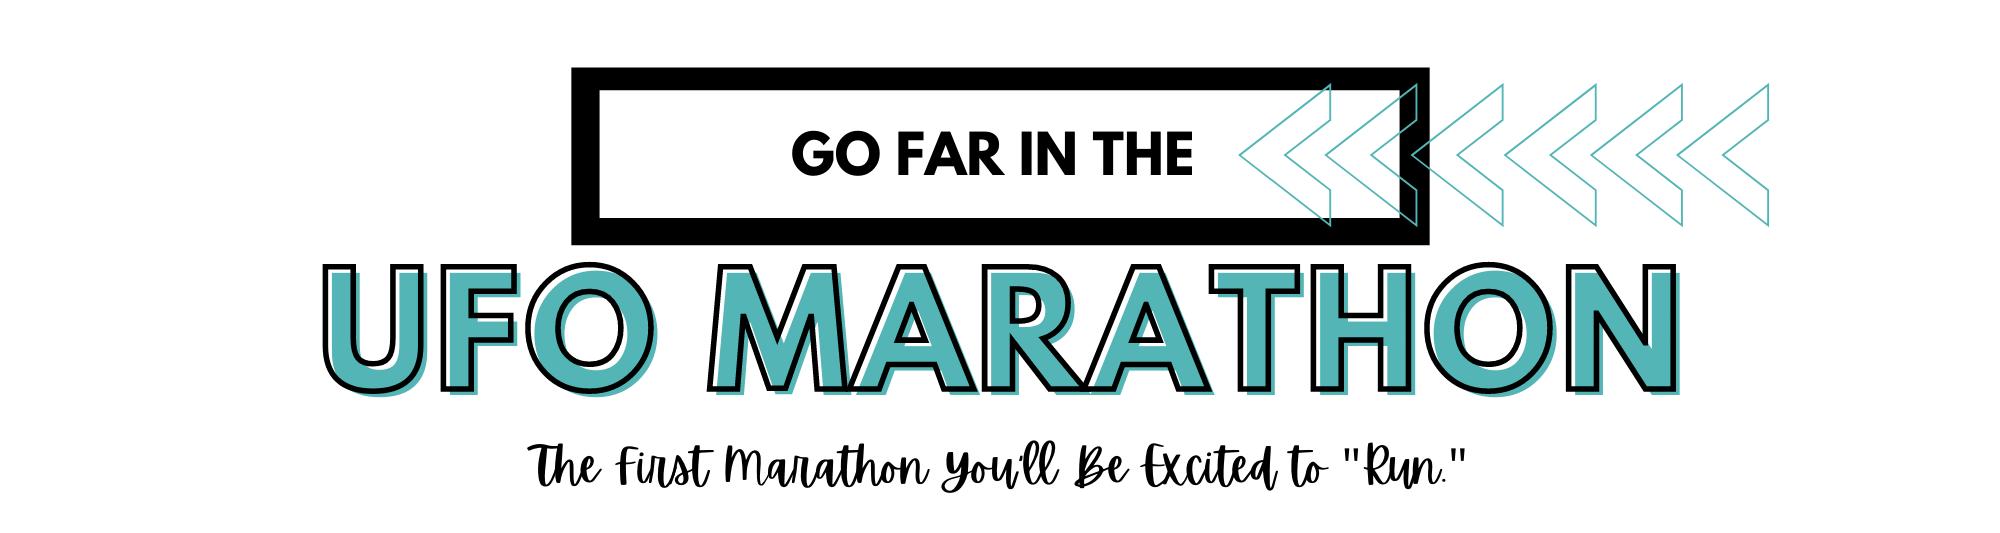 Go Far in the UFO Marathon